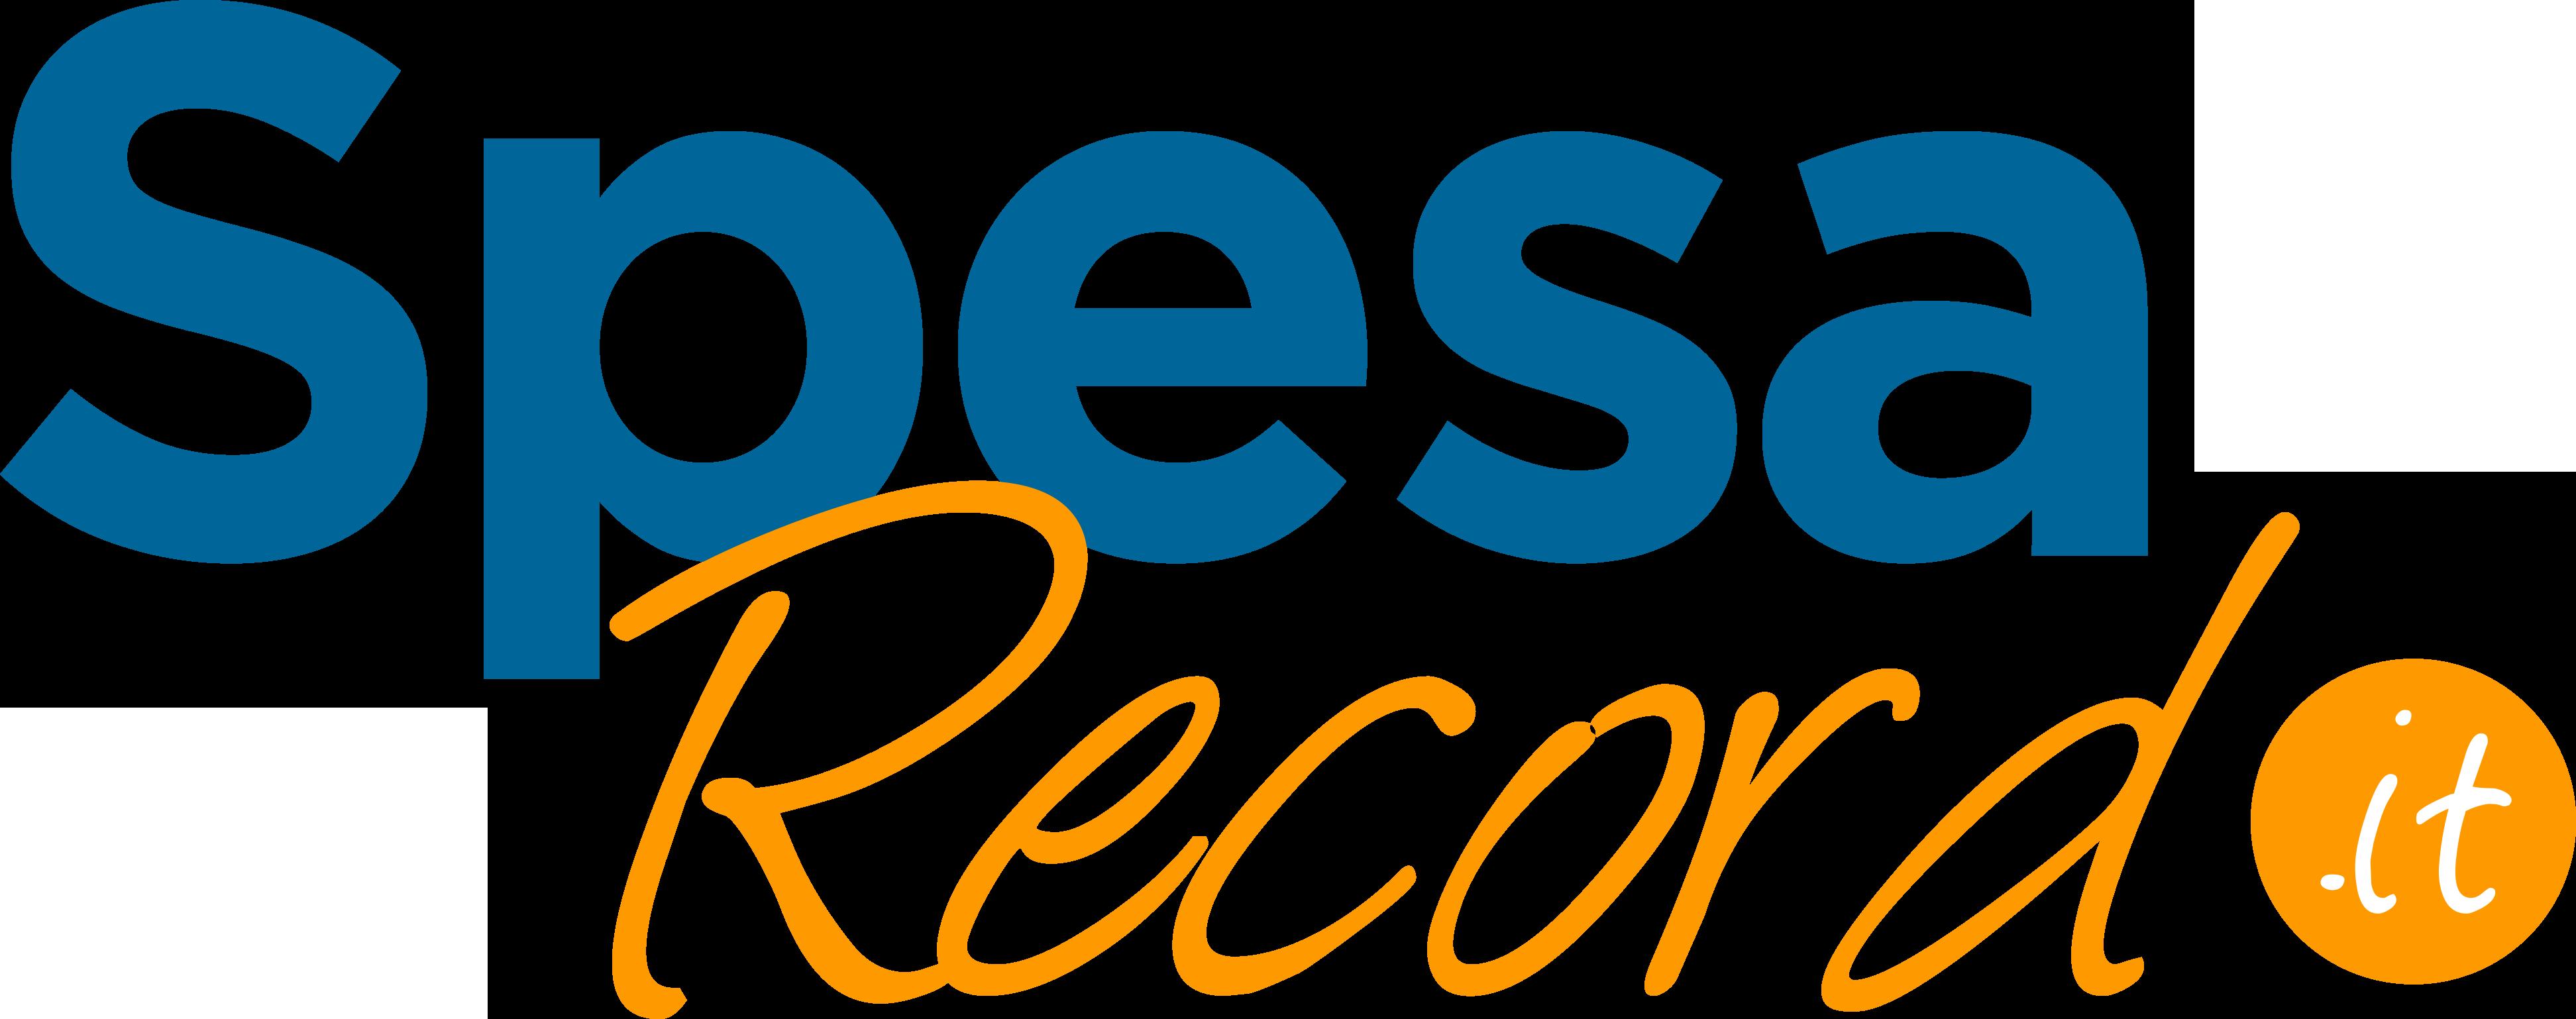 SpesaRecord